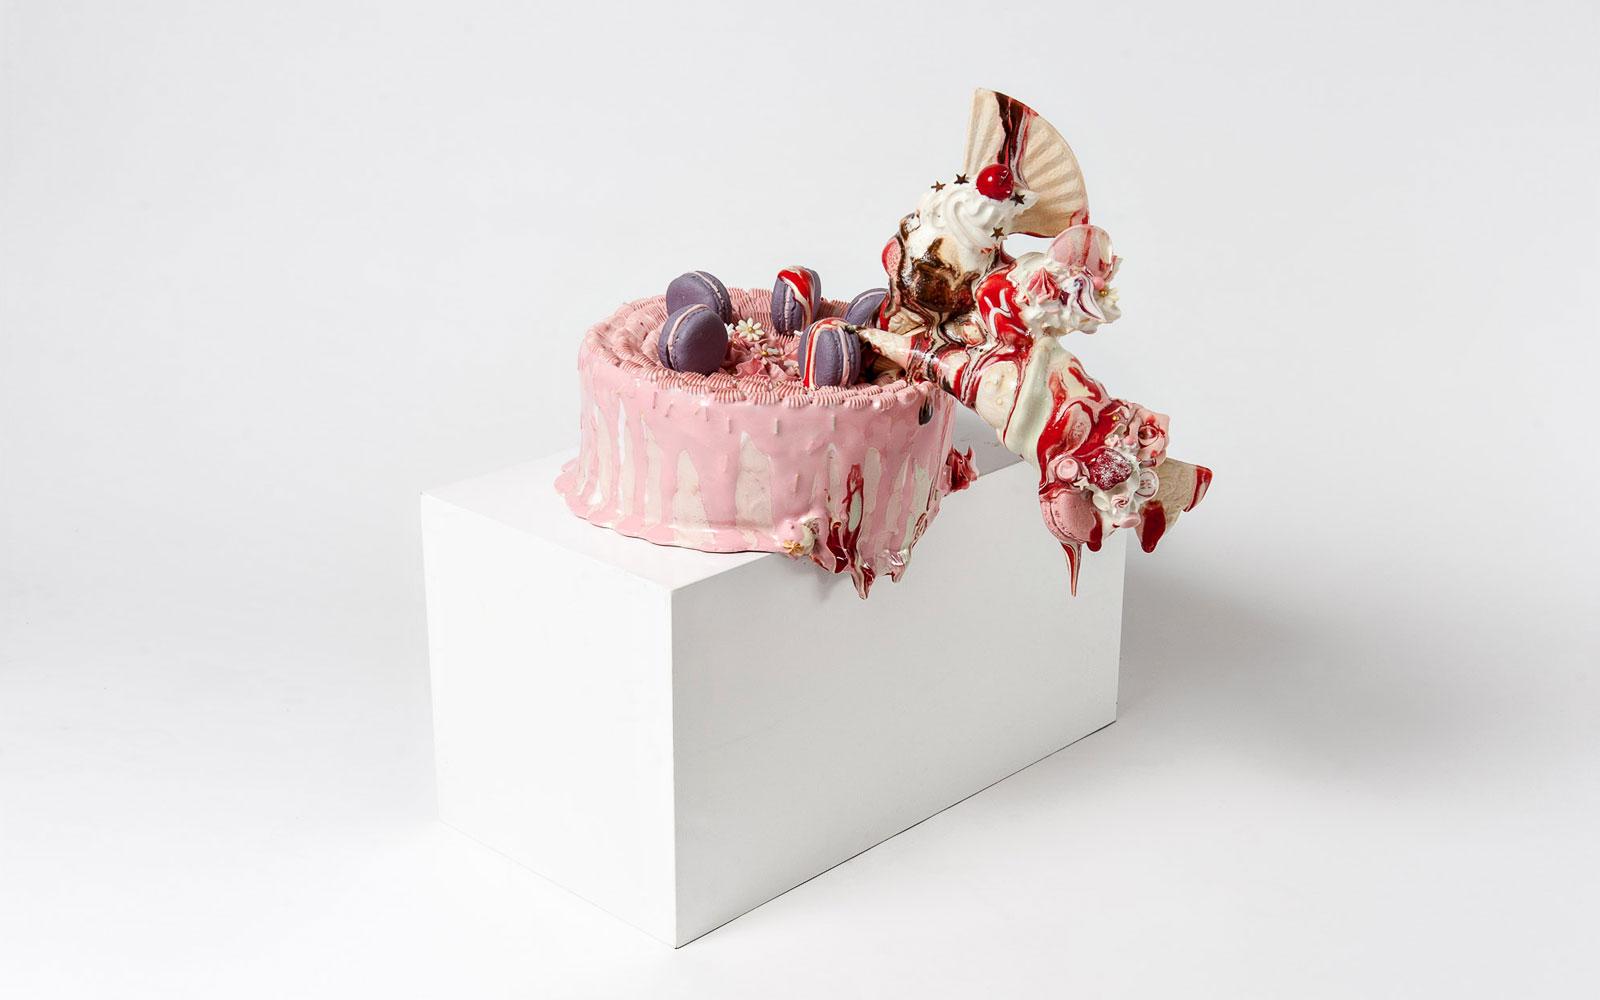 FI-anna-barlow-ceramics-ice-cream-03.jpg